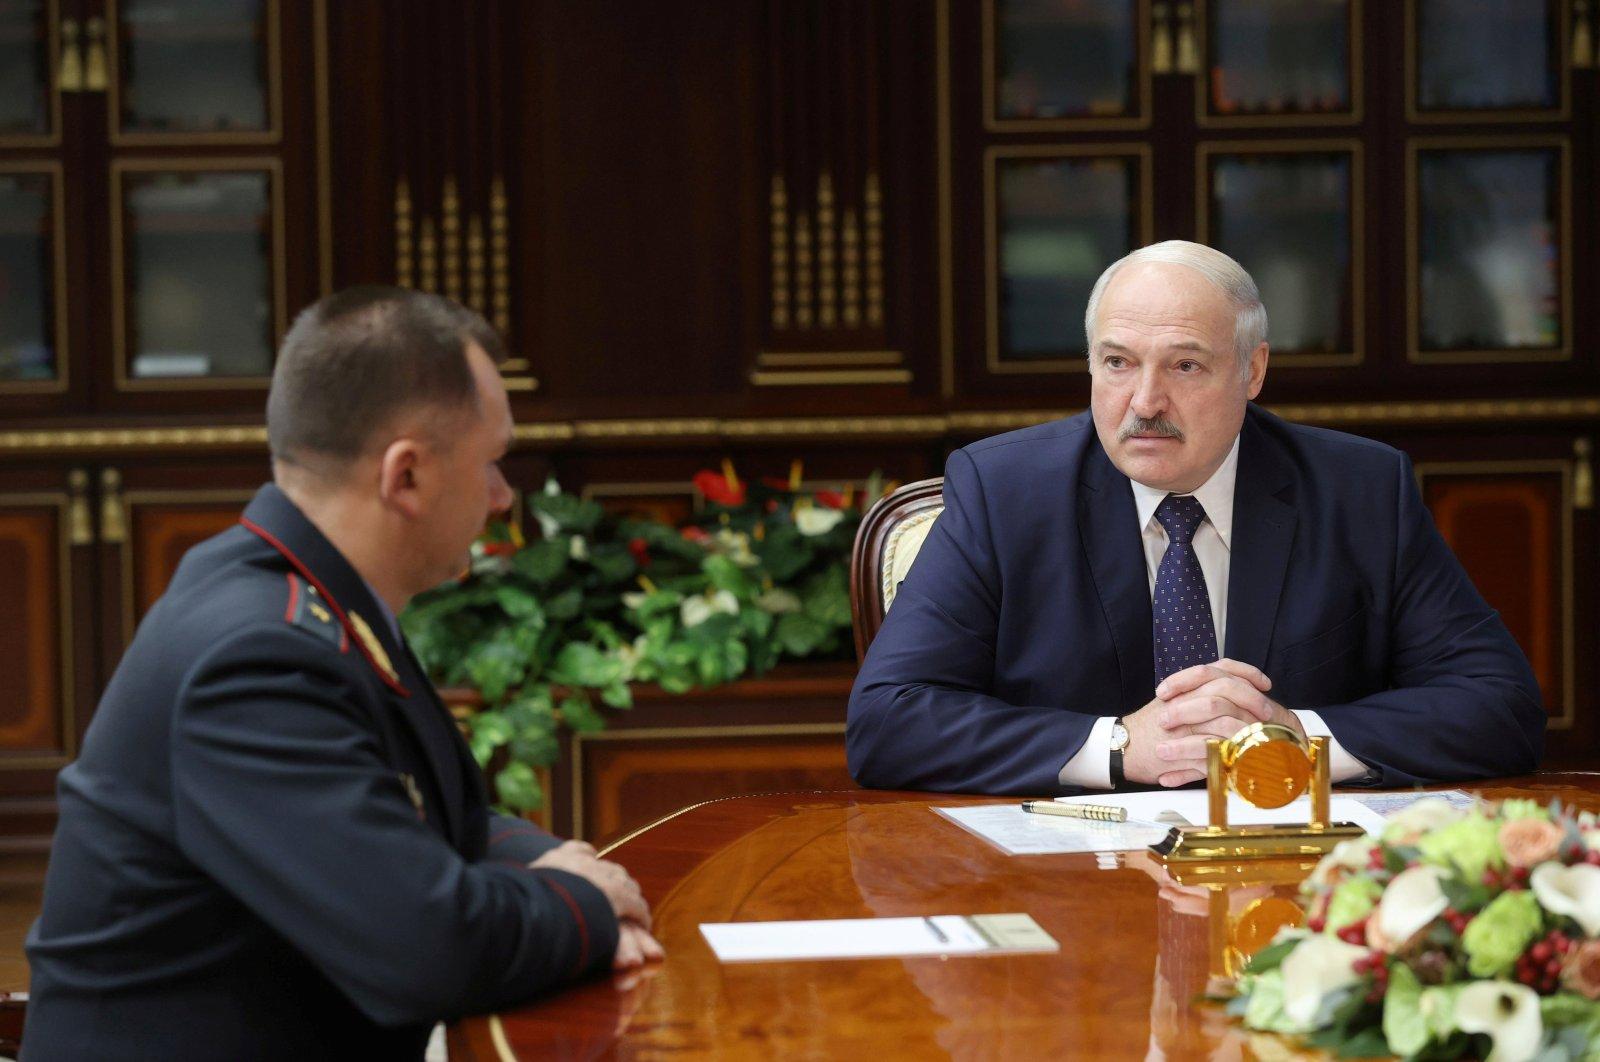 Belarusian President Alexander Lukashenko meets with newly-appointed Interior Minister Ivan Kubrakov in Minsk, Belarus, Oct. 29, 2020. (Reuters Photo)